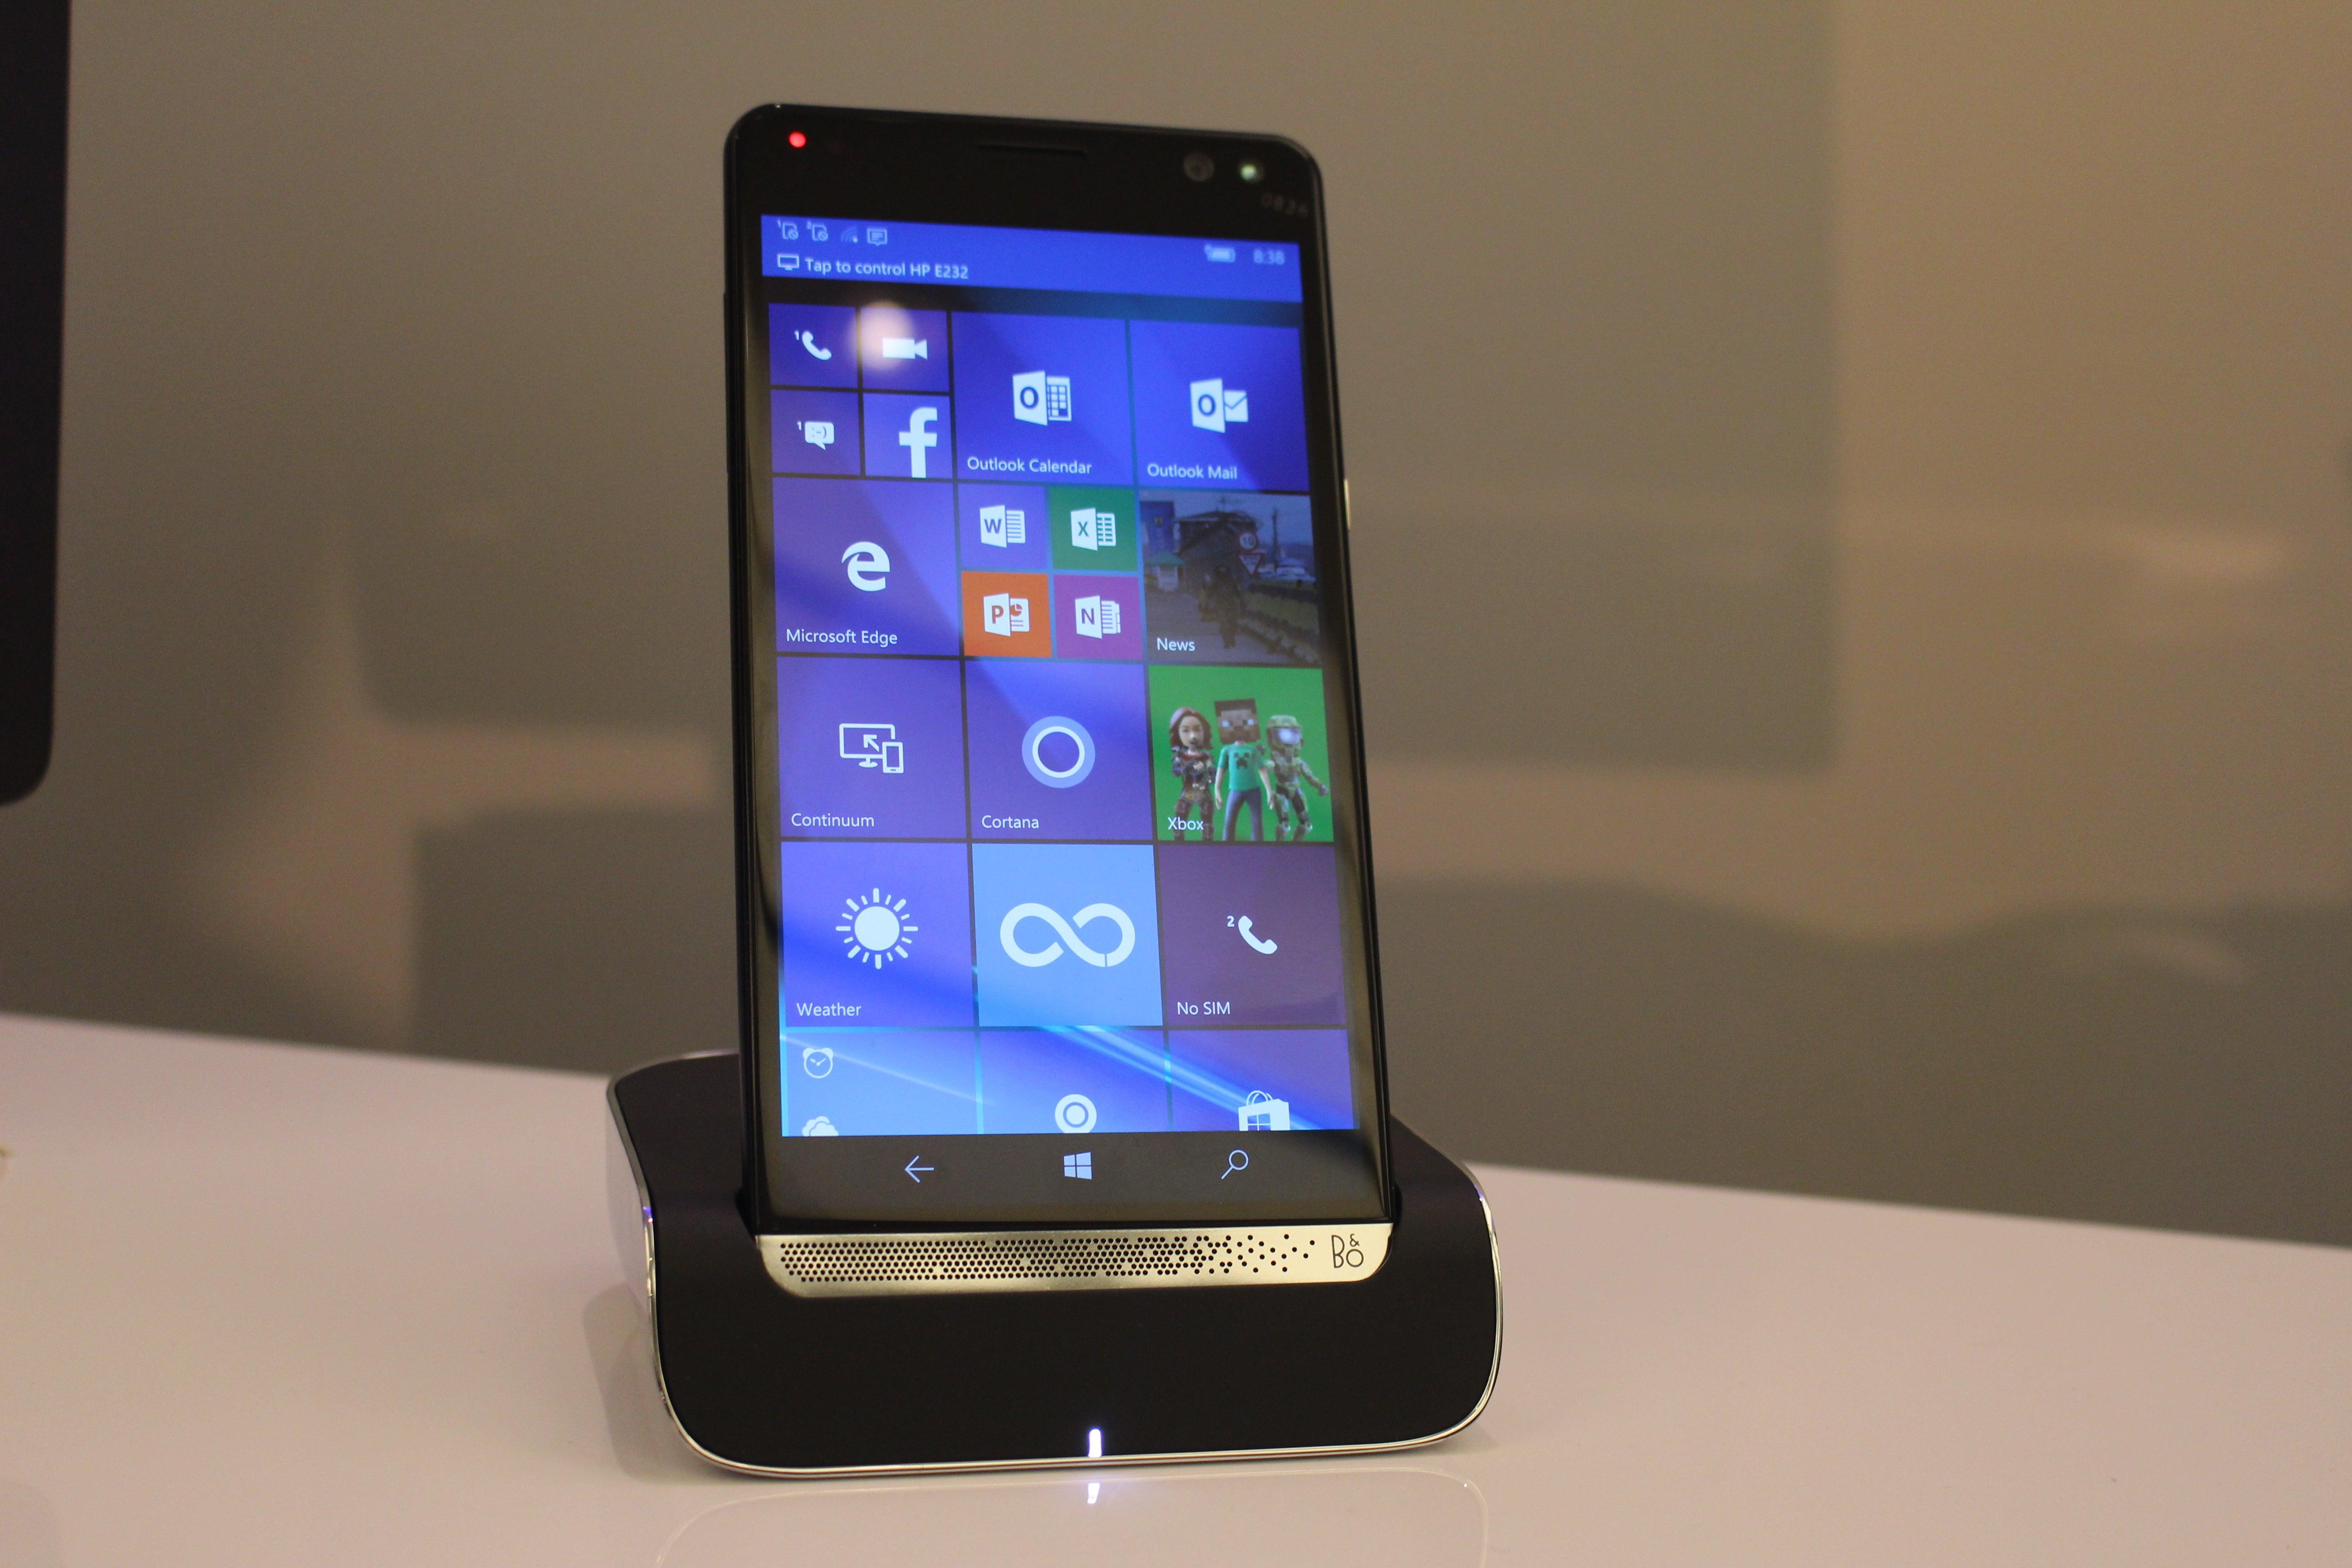 HP's Elite x3 is a flagship sailing into a dangerous Windows phone ...